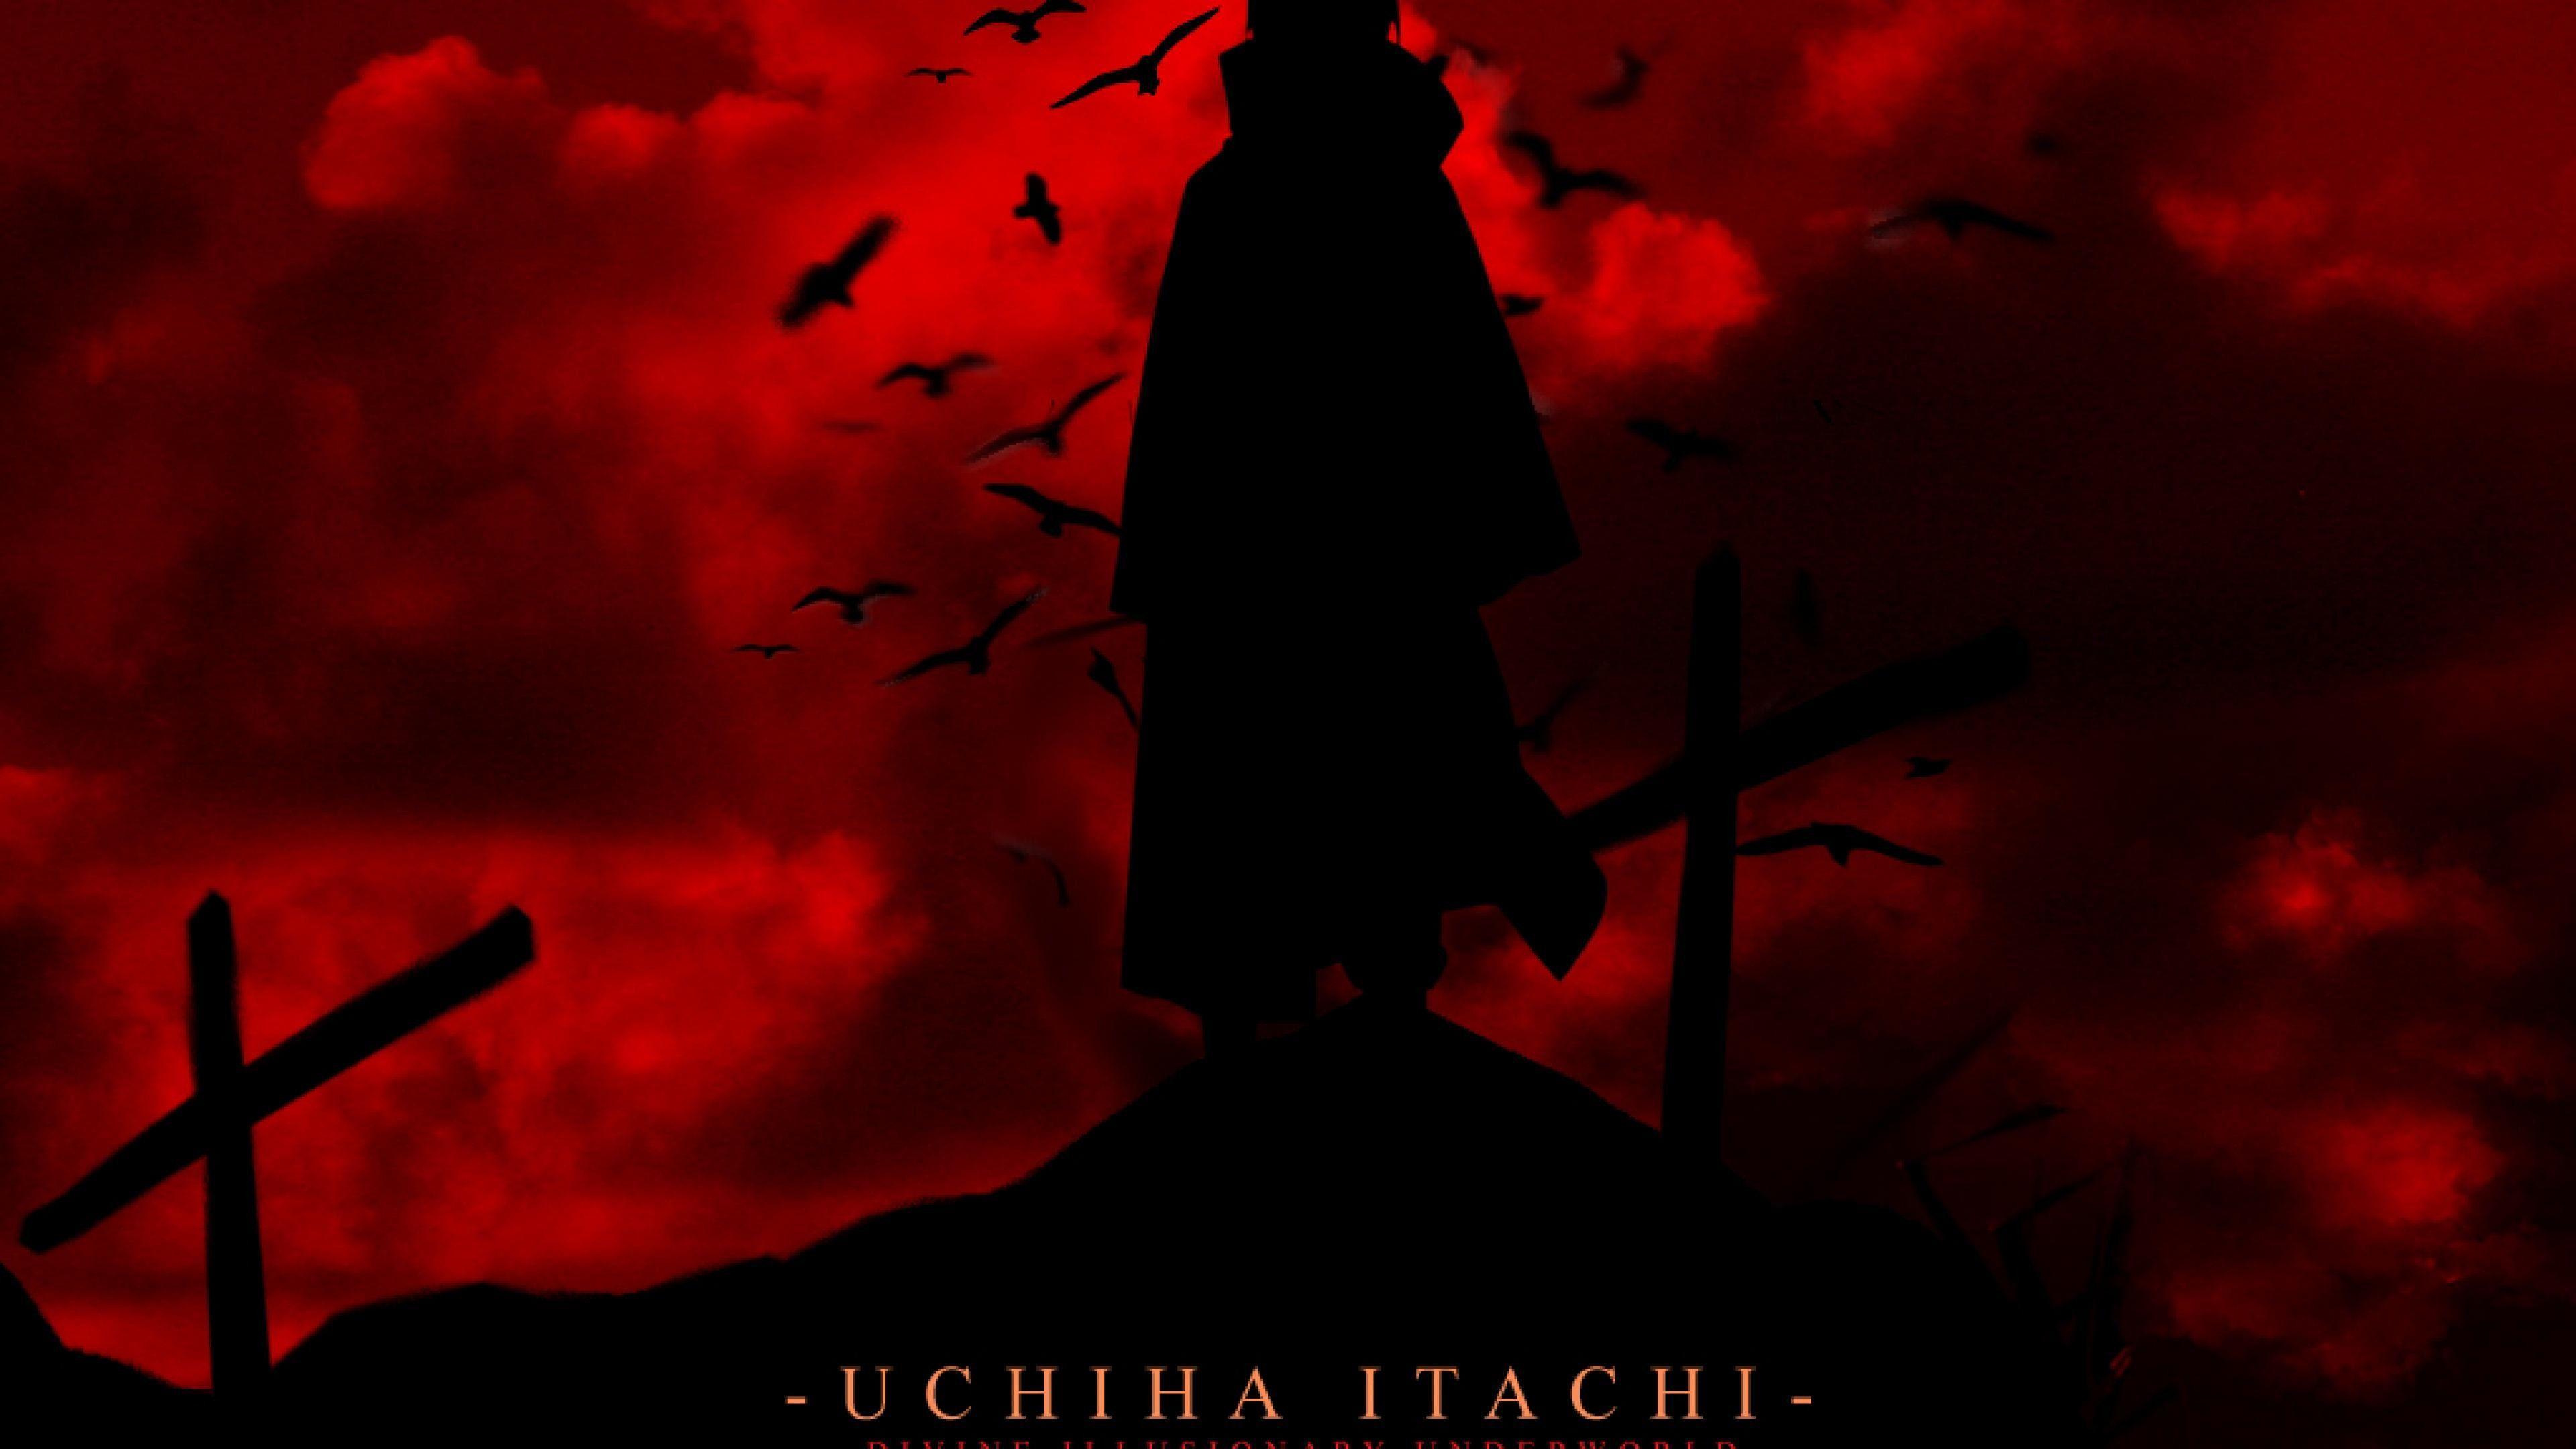 Naruto Itachi Uchiha Wallpapers Top Free Naruto Itachi Uchiha Backgrounds Wallpaperaccess